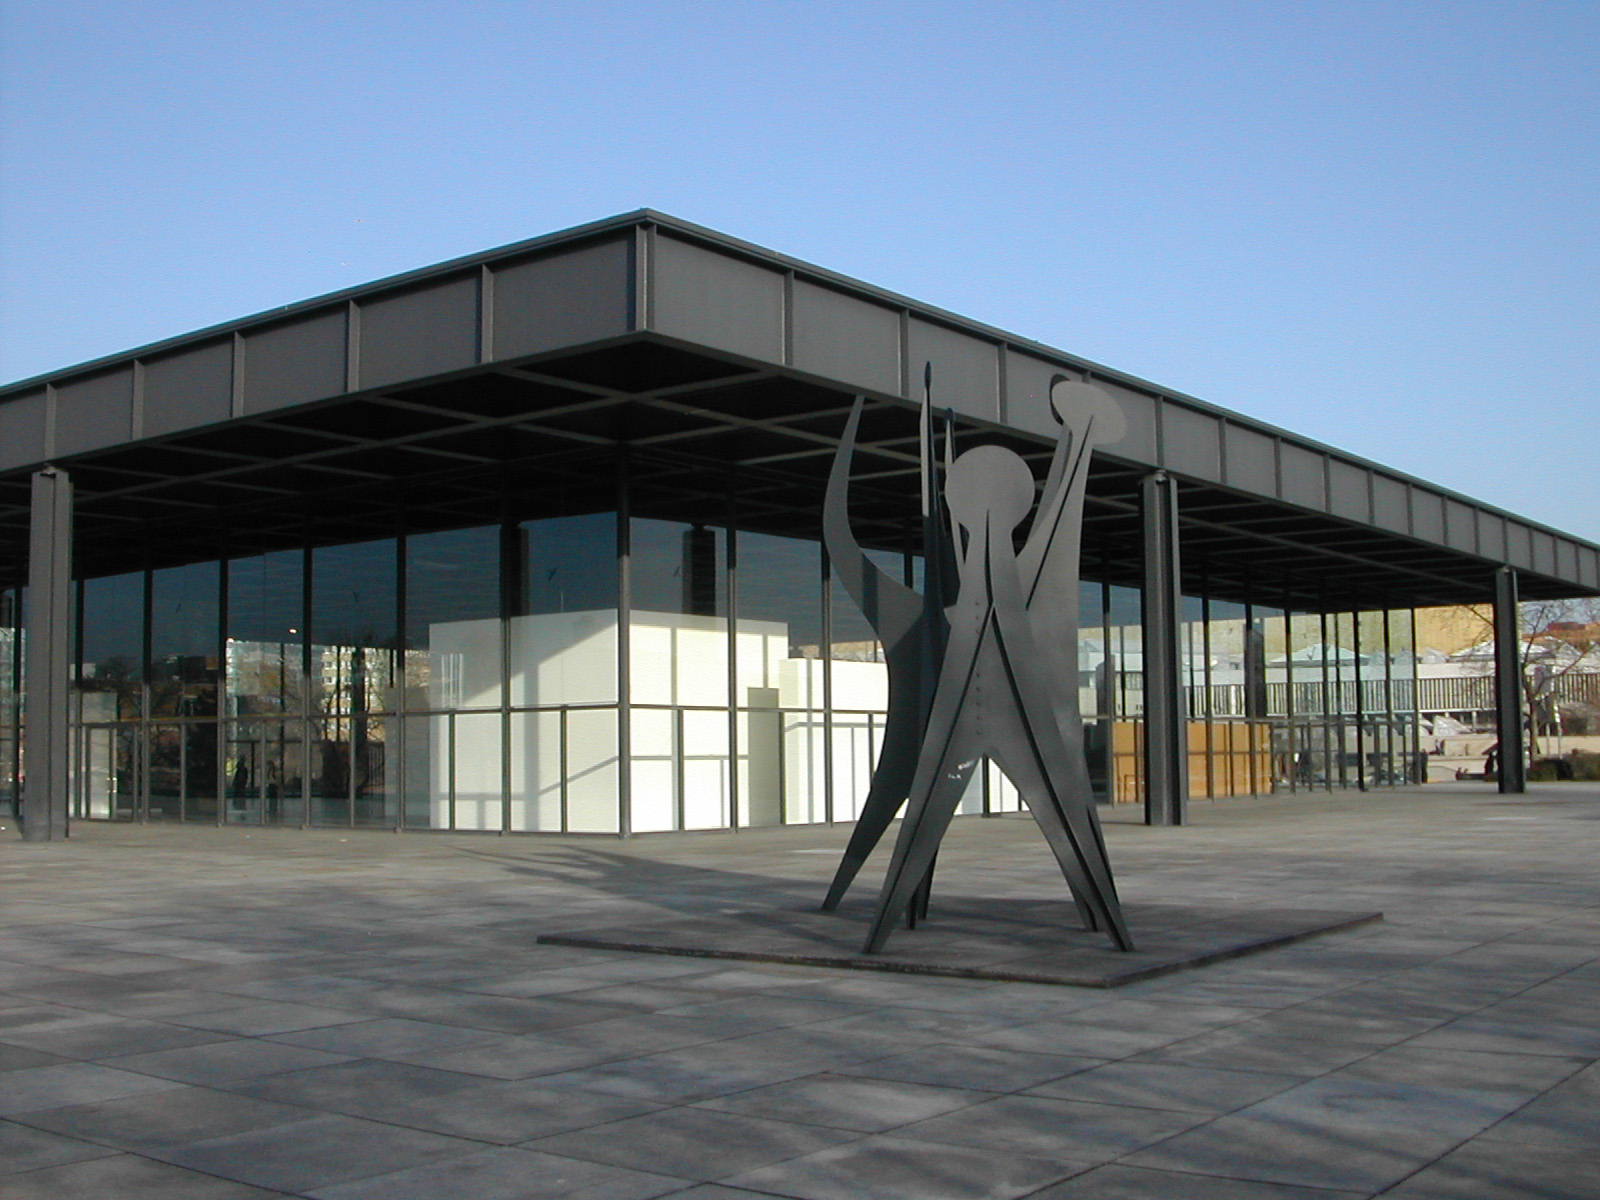 Neue_Nationalgalerie_Berlin_2004-02-21